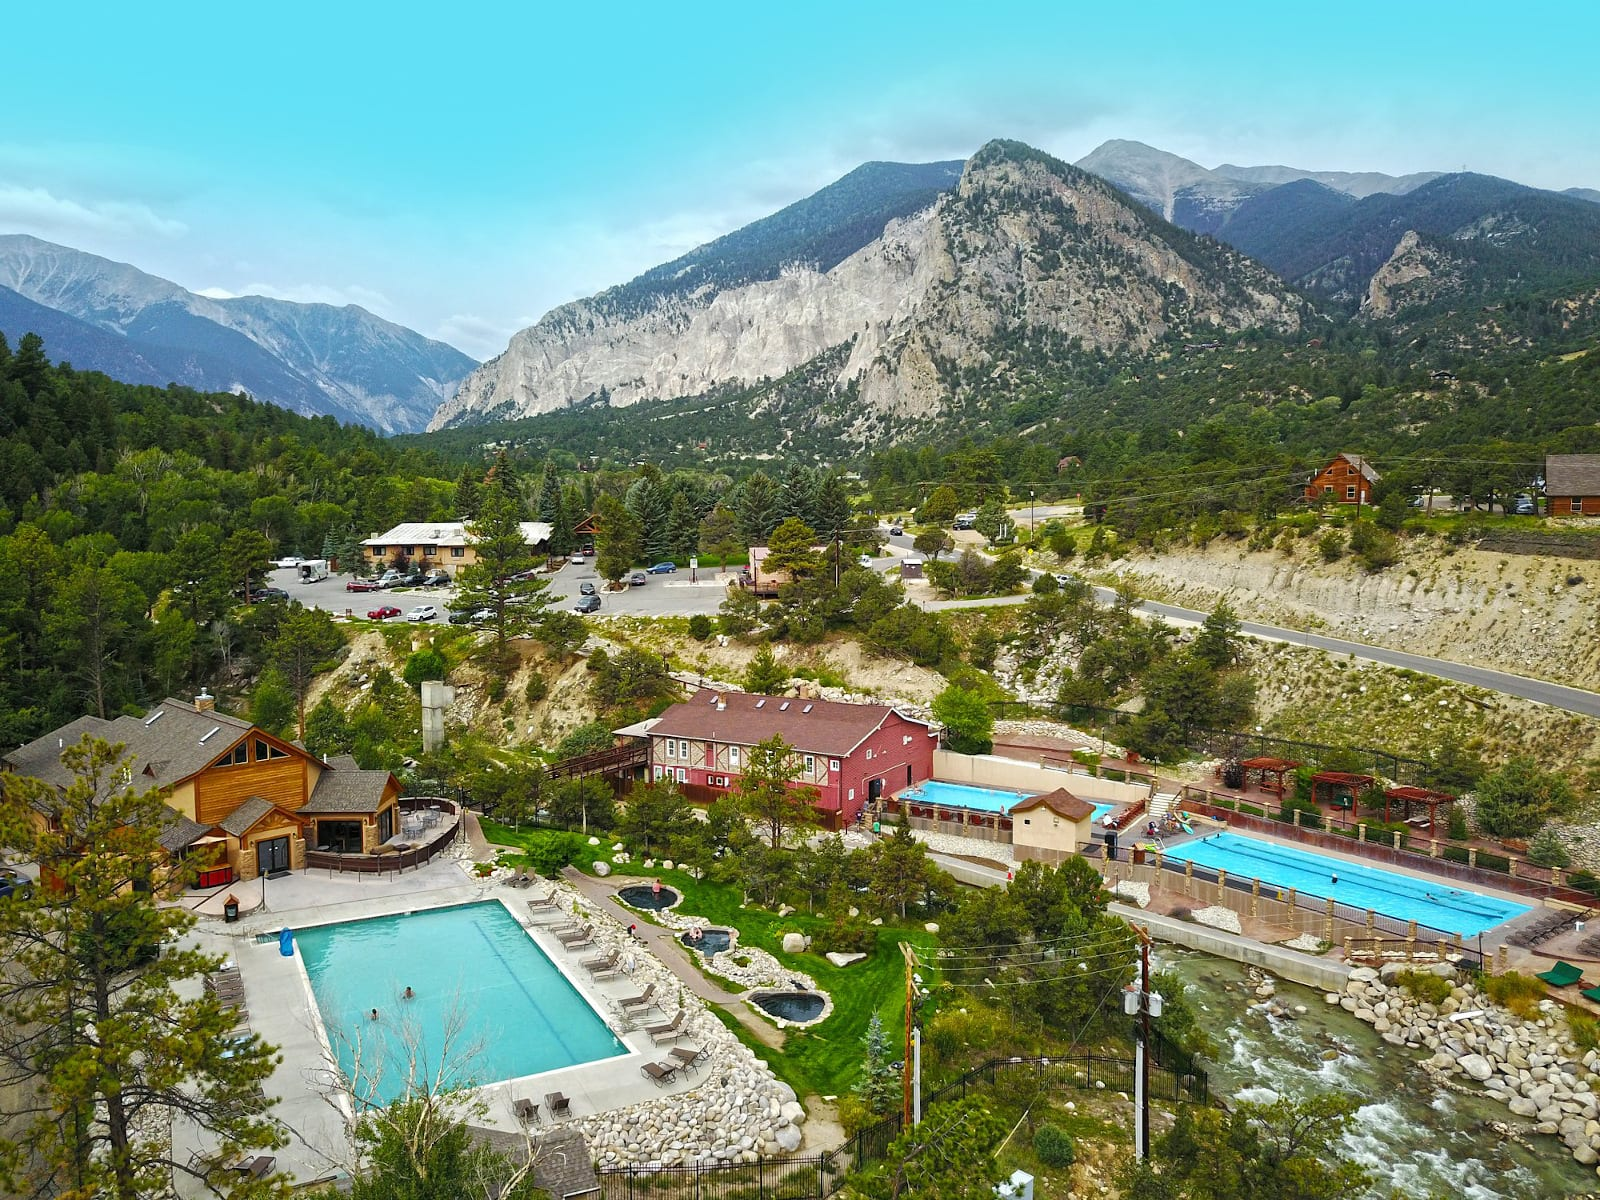 Mount Princeton Hot Springs Resort Aerial View Nathrop CO